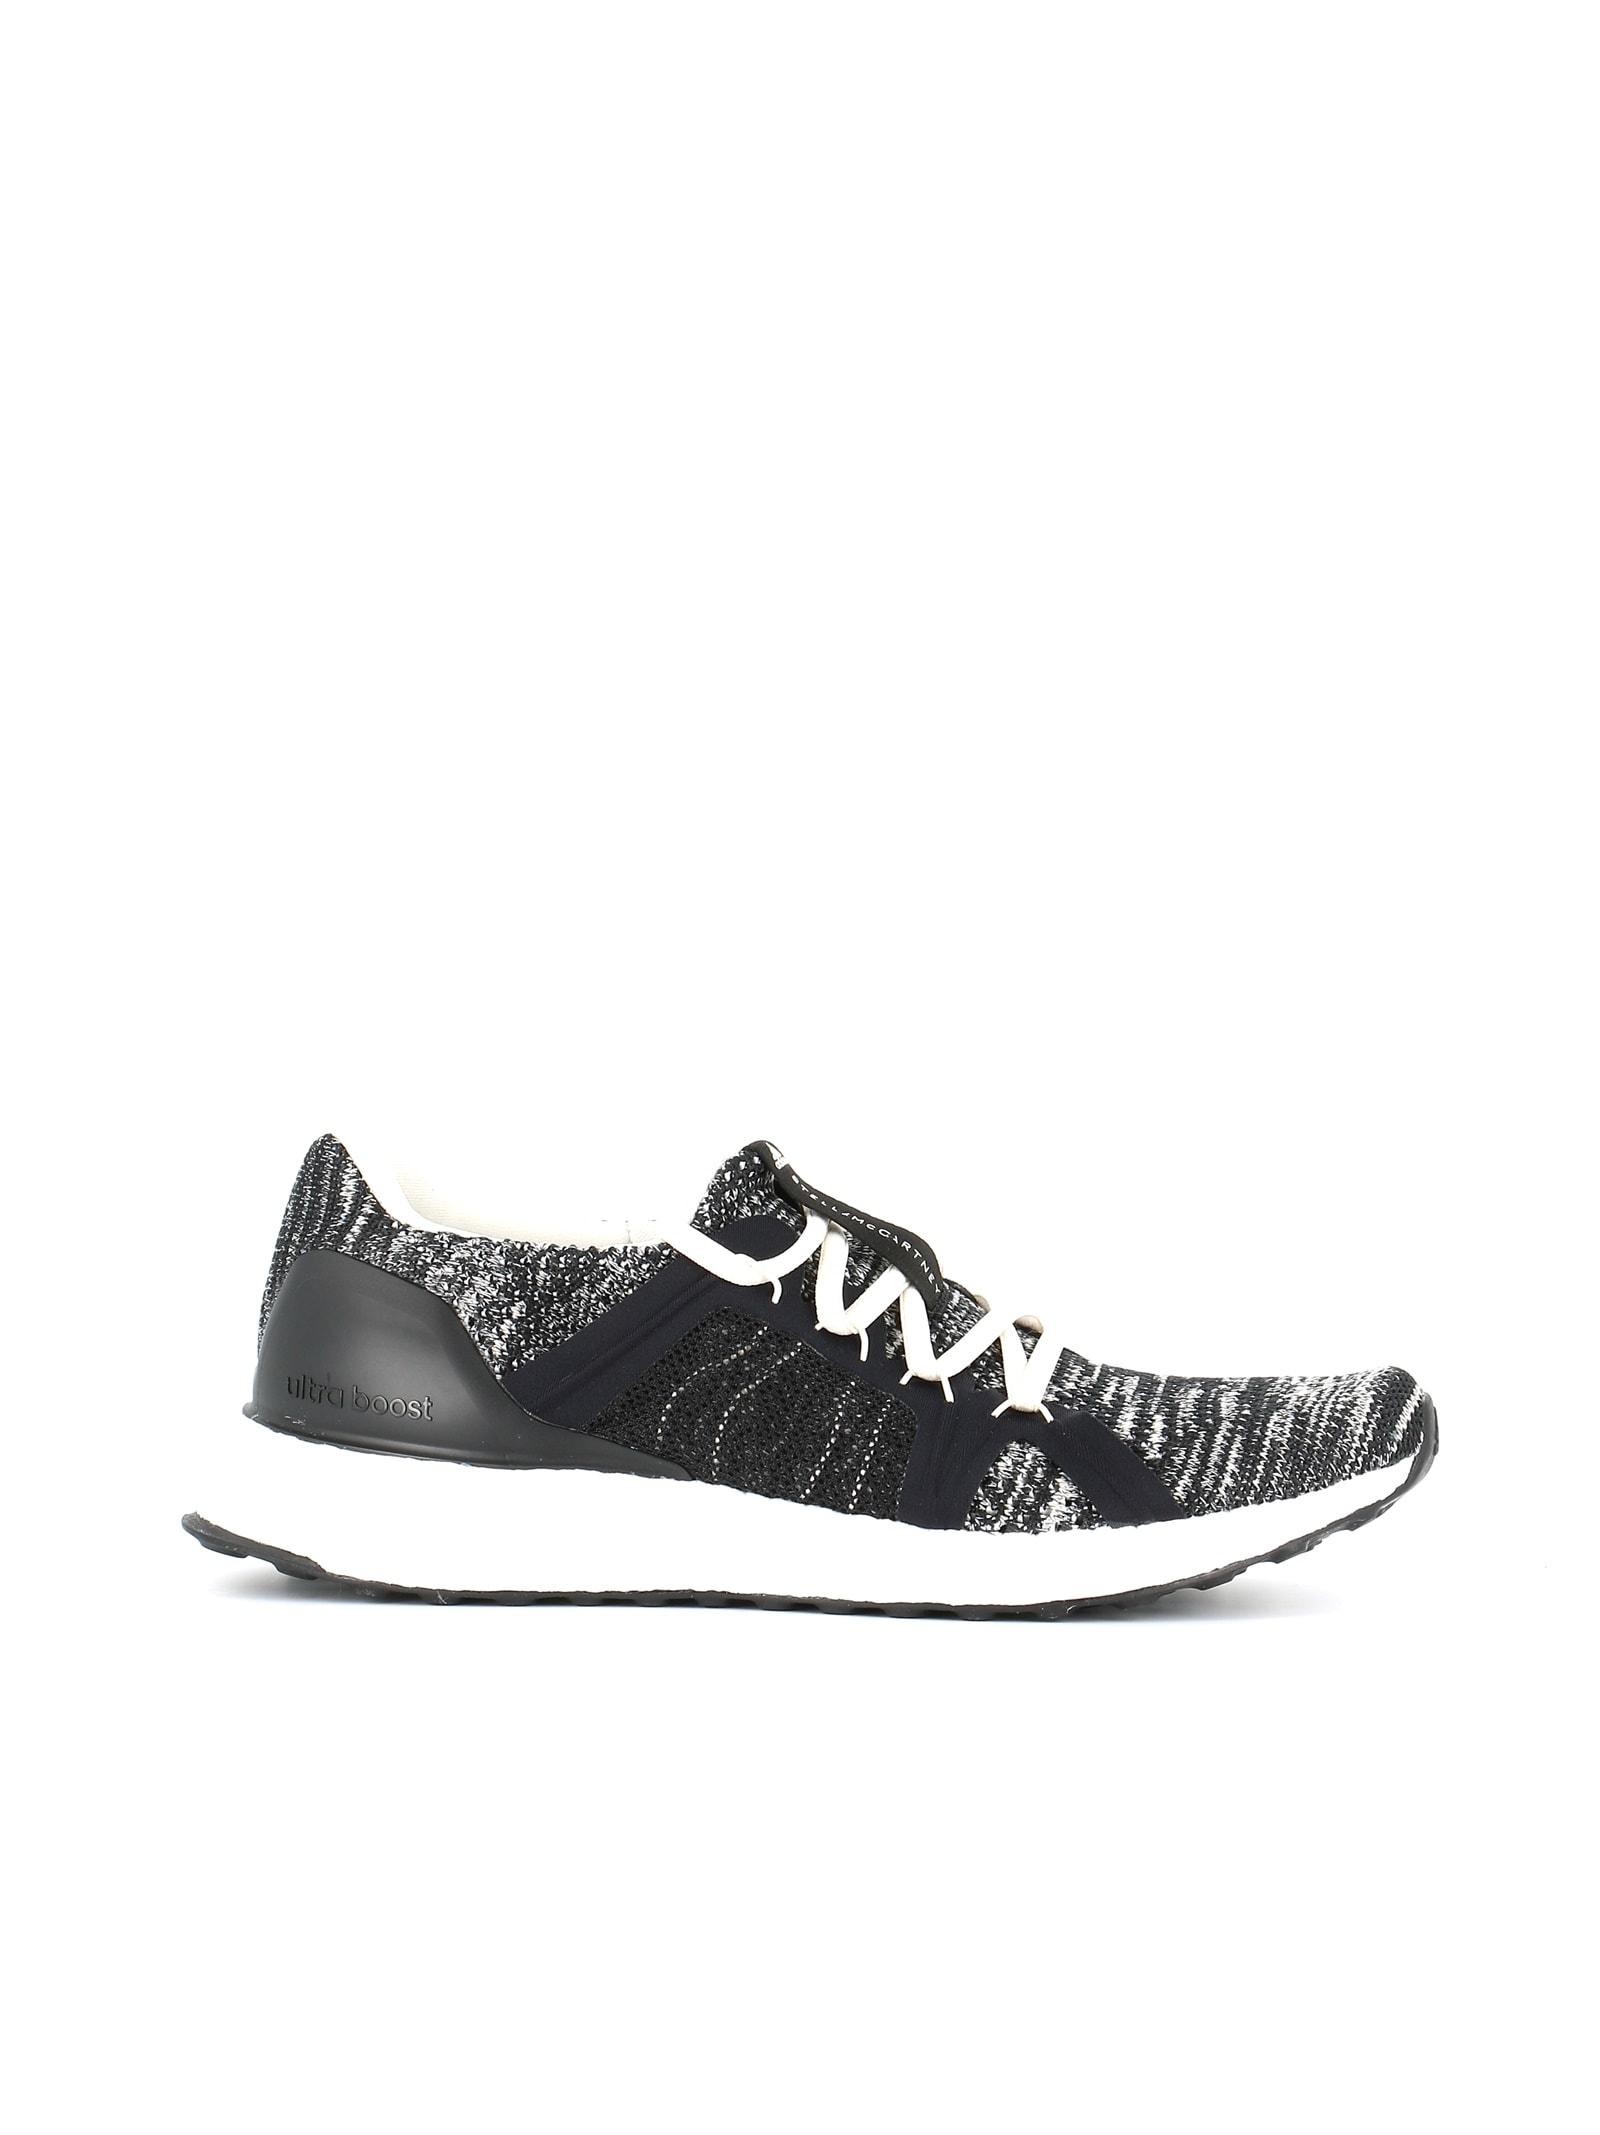 timeless design 01040 fce1a Adidas By Stella Mccartney Sneaker